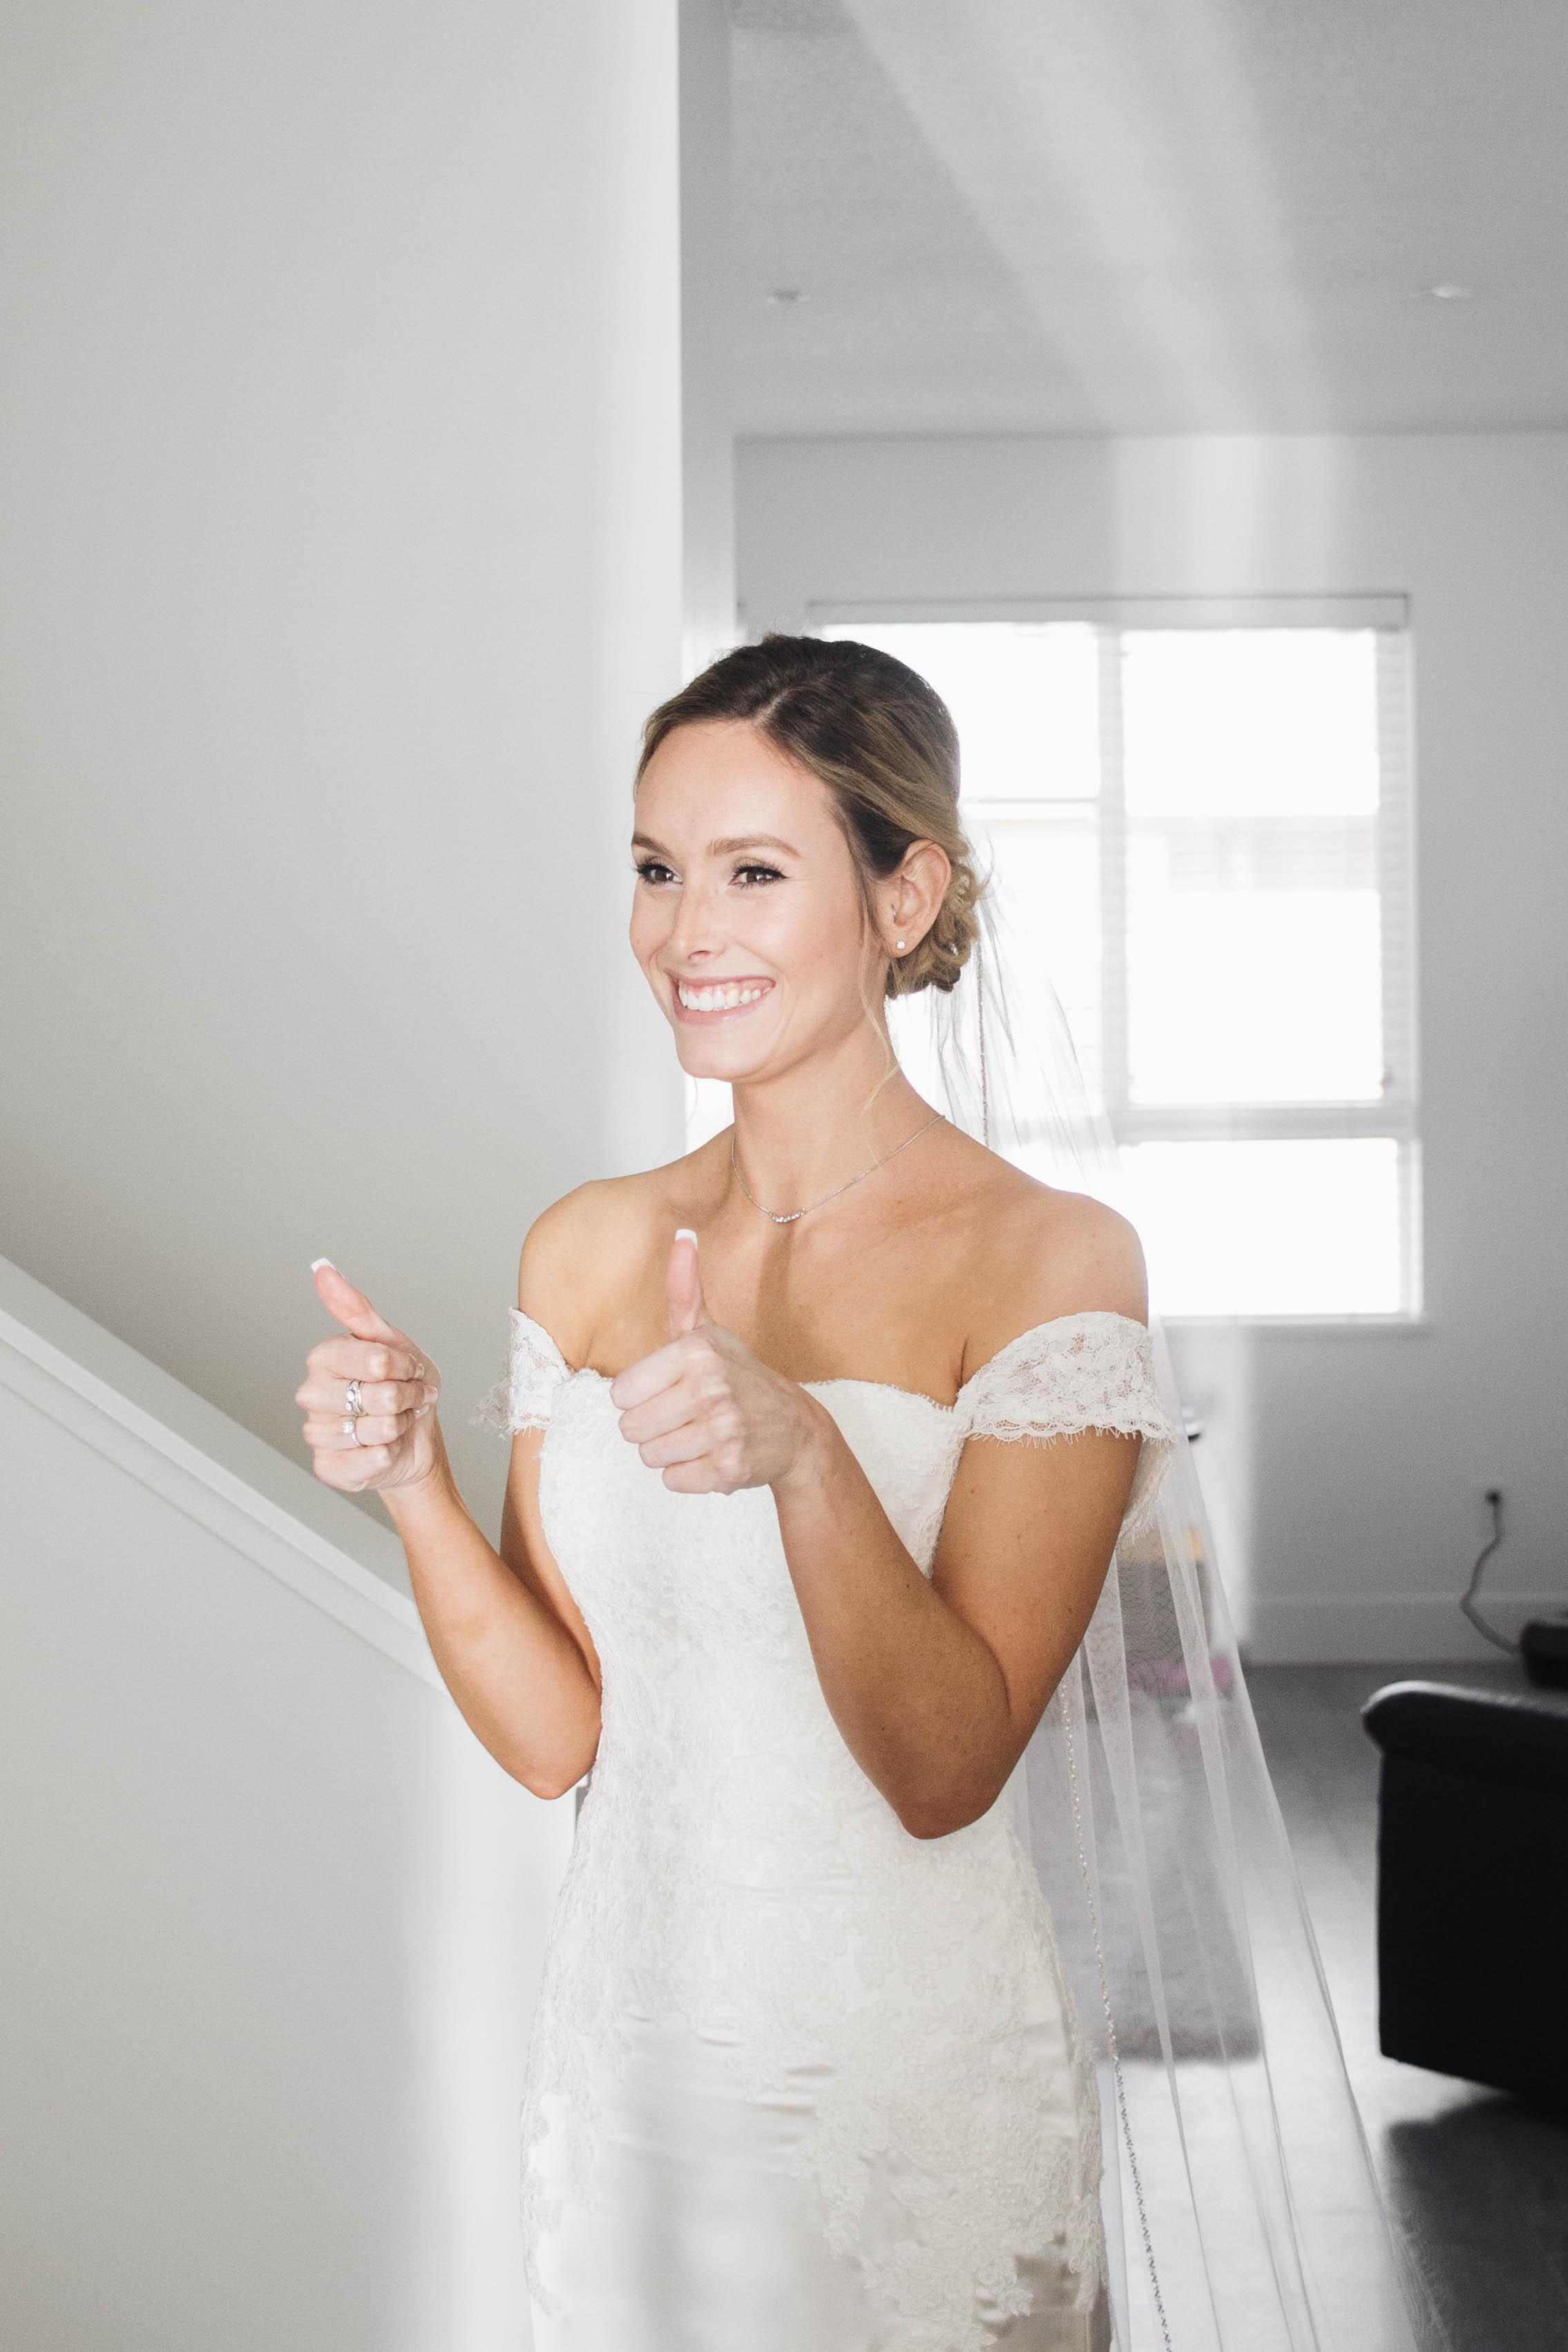 jenna-getting-married-128.jpg